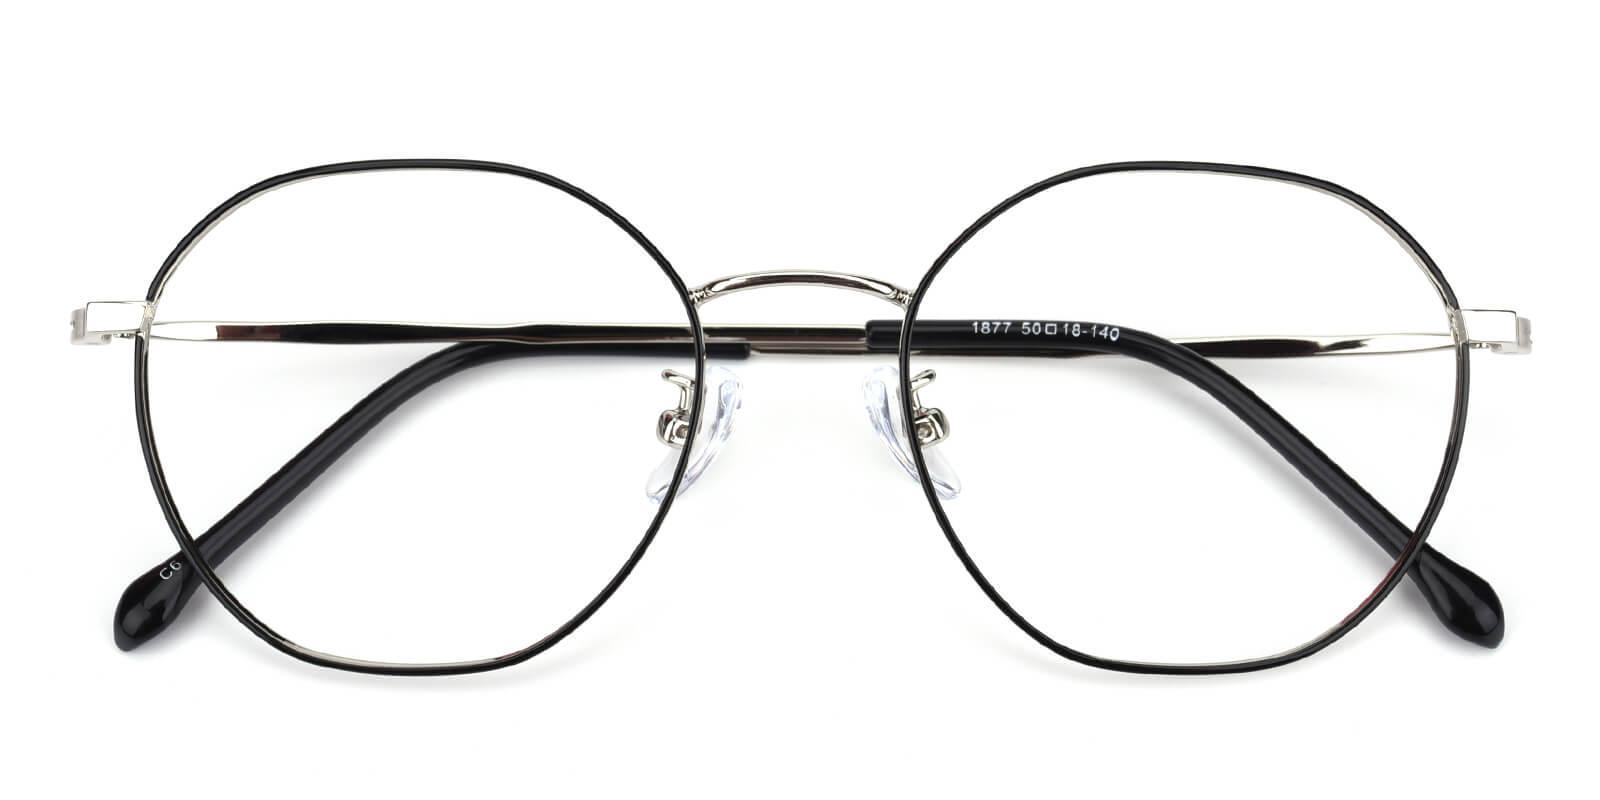 Govind-Black-Round-Metal-Eyeglasses-detail